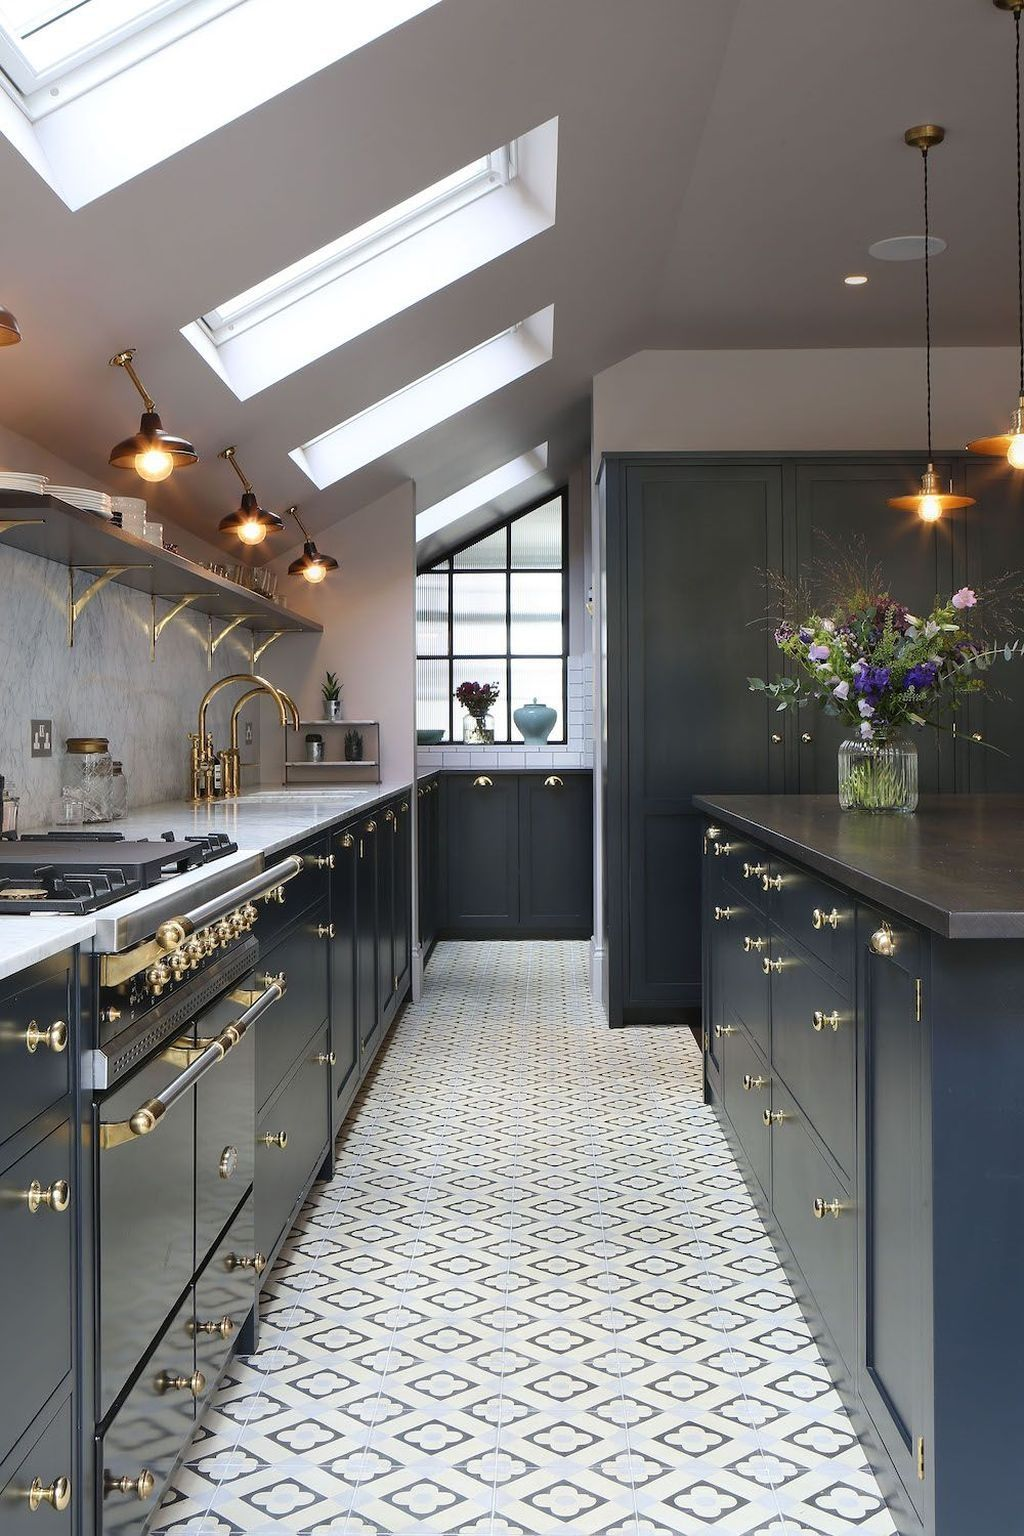 35 Elegant Kitchen Lighting Design Ideas Kitchen Pinterest